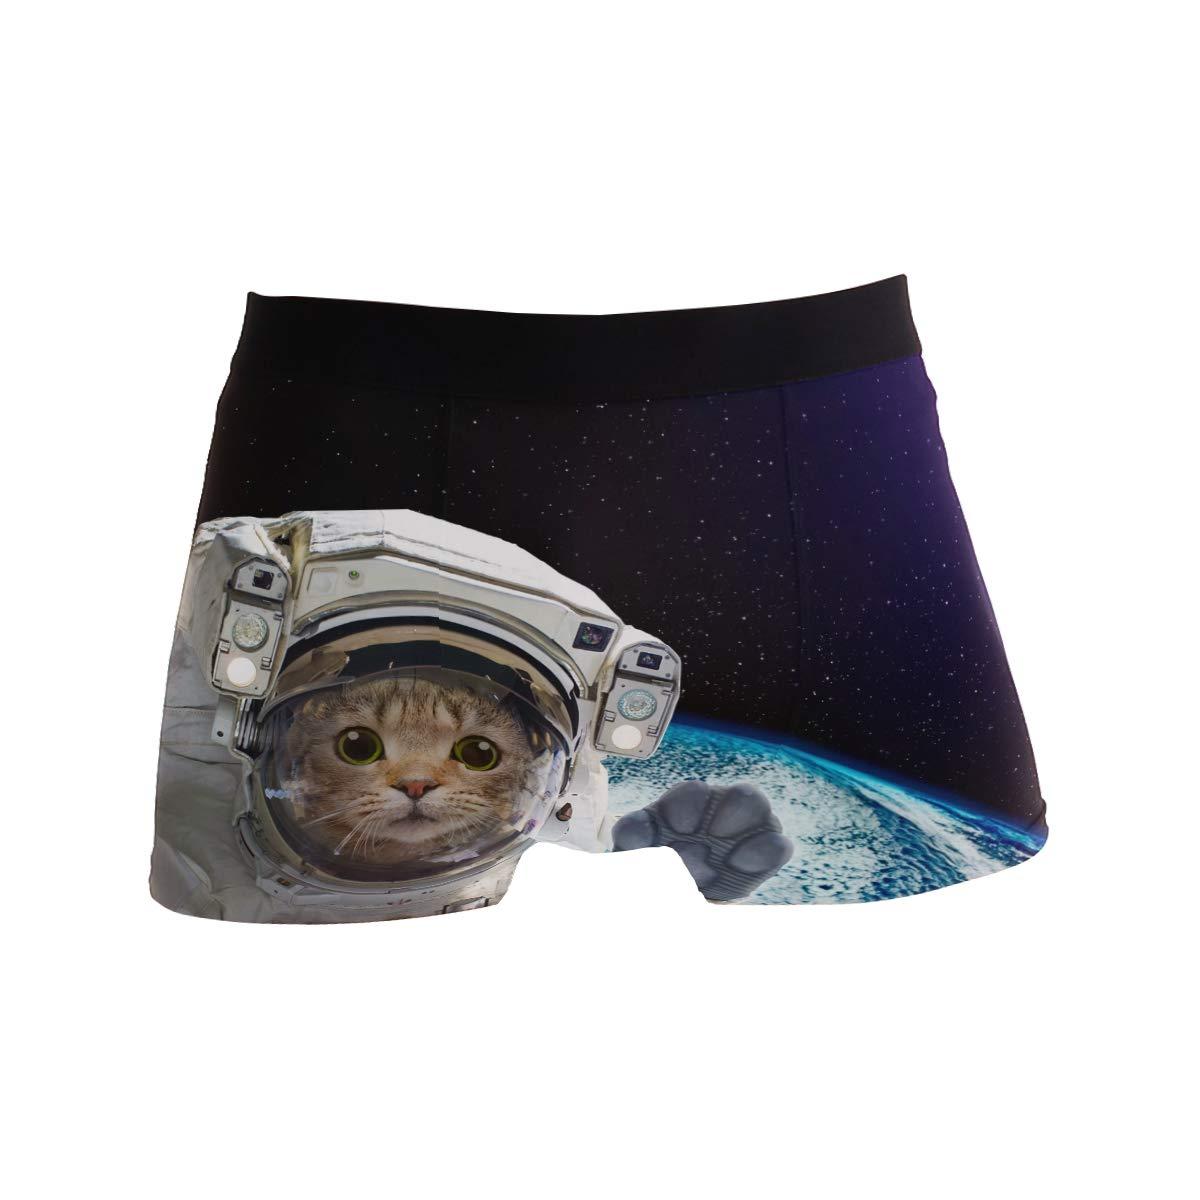 ZZKKO Astronaut Cat Mens Boxer Briefs Underwear Breathable Stretch Boxer Trunk with Pouch S-XL